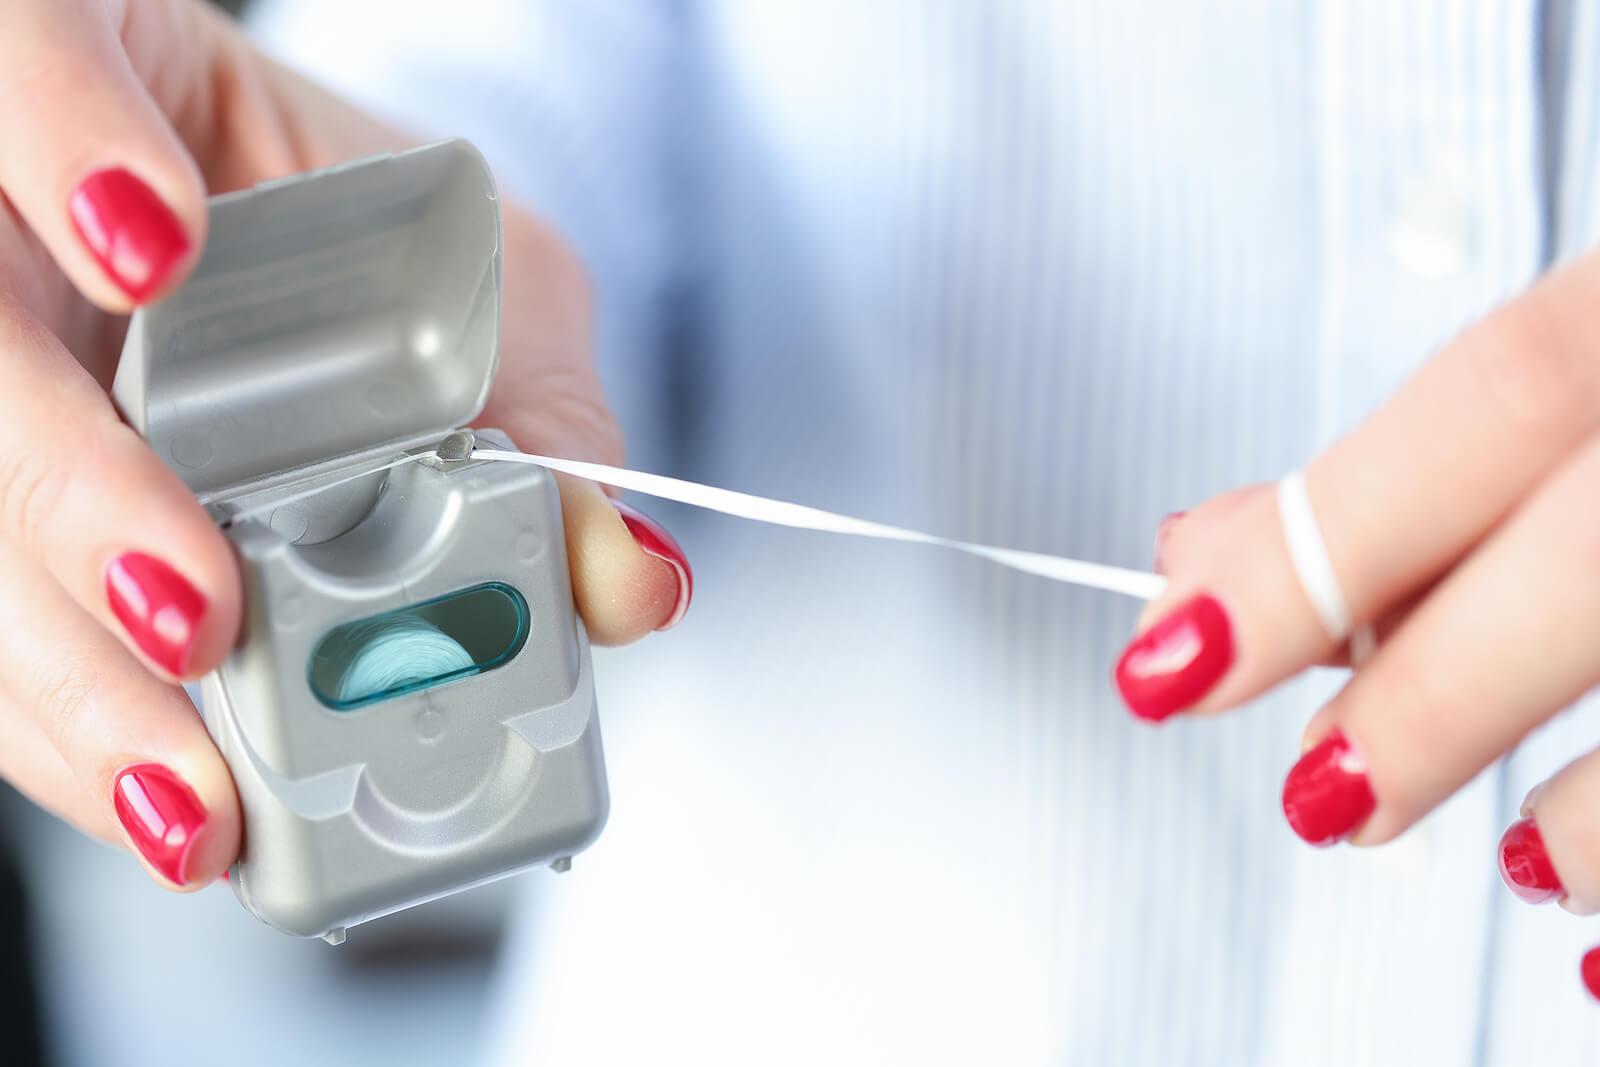 Cómo usar hilo dental correctamente.